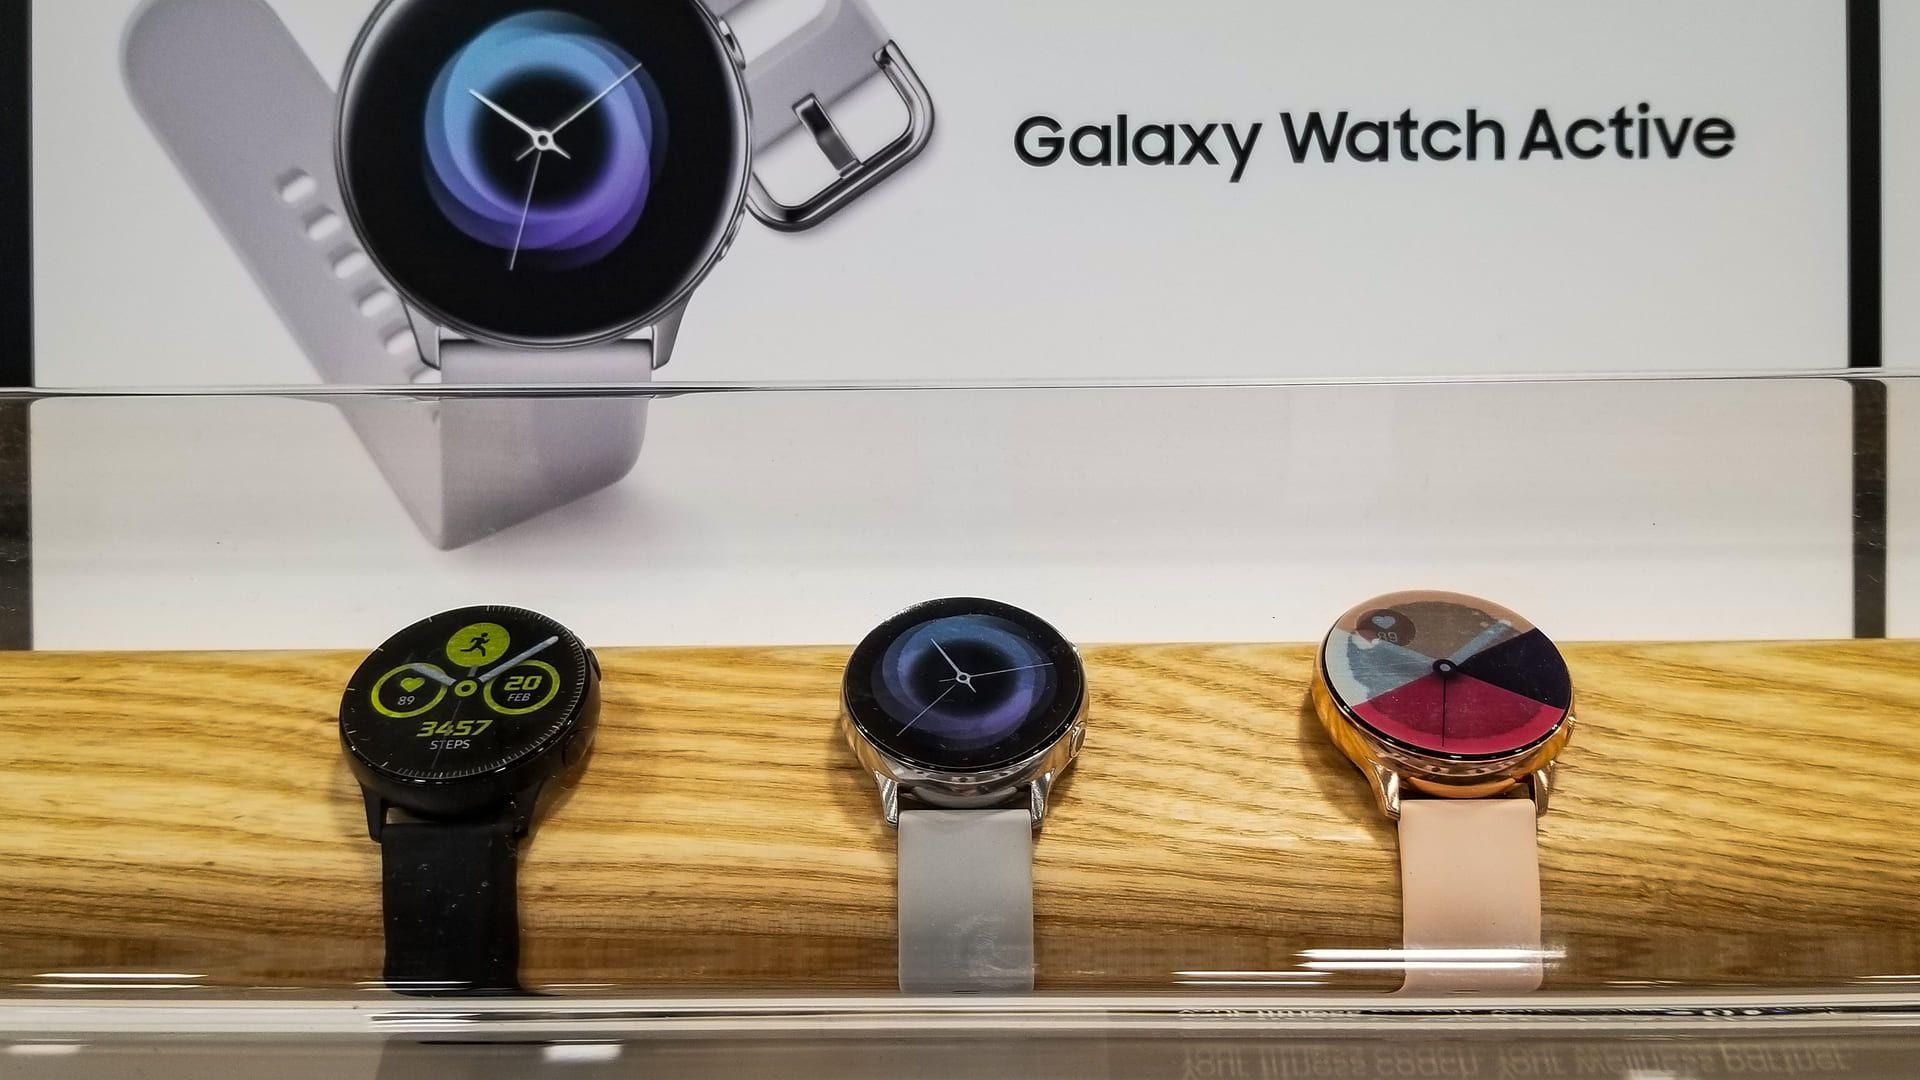 Smartwatch Galaxy Watch Active é o modelo mais barato. (Foto: Shutterstock)